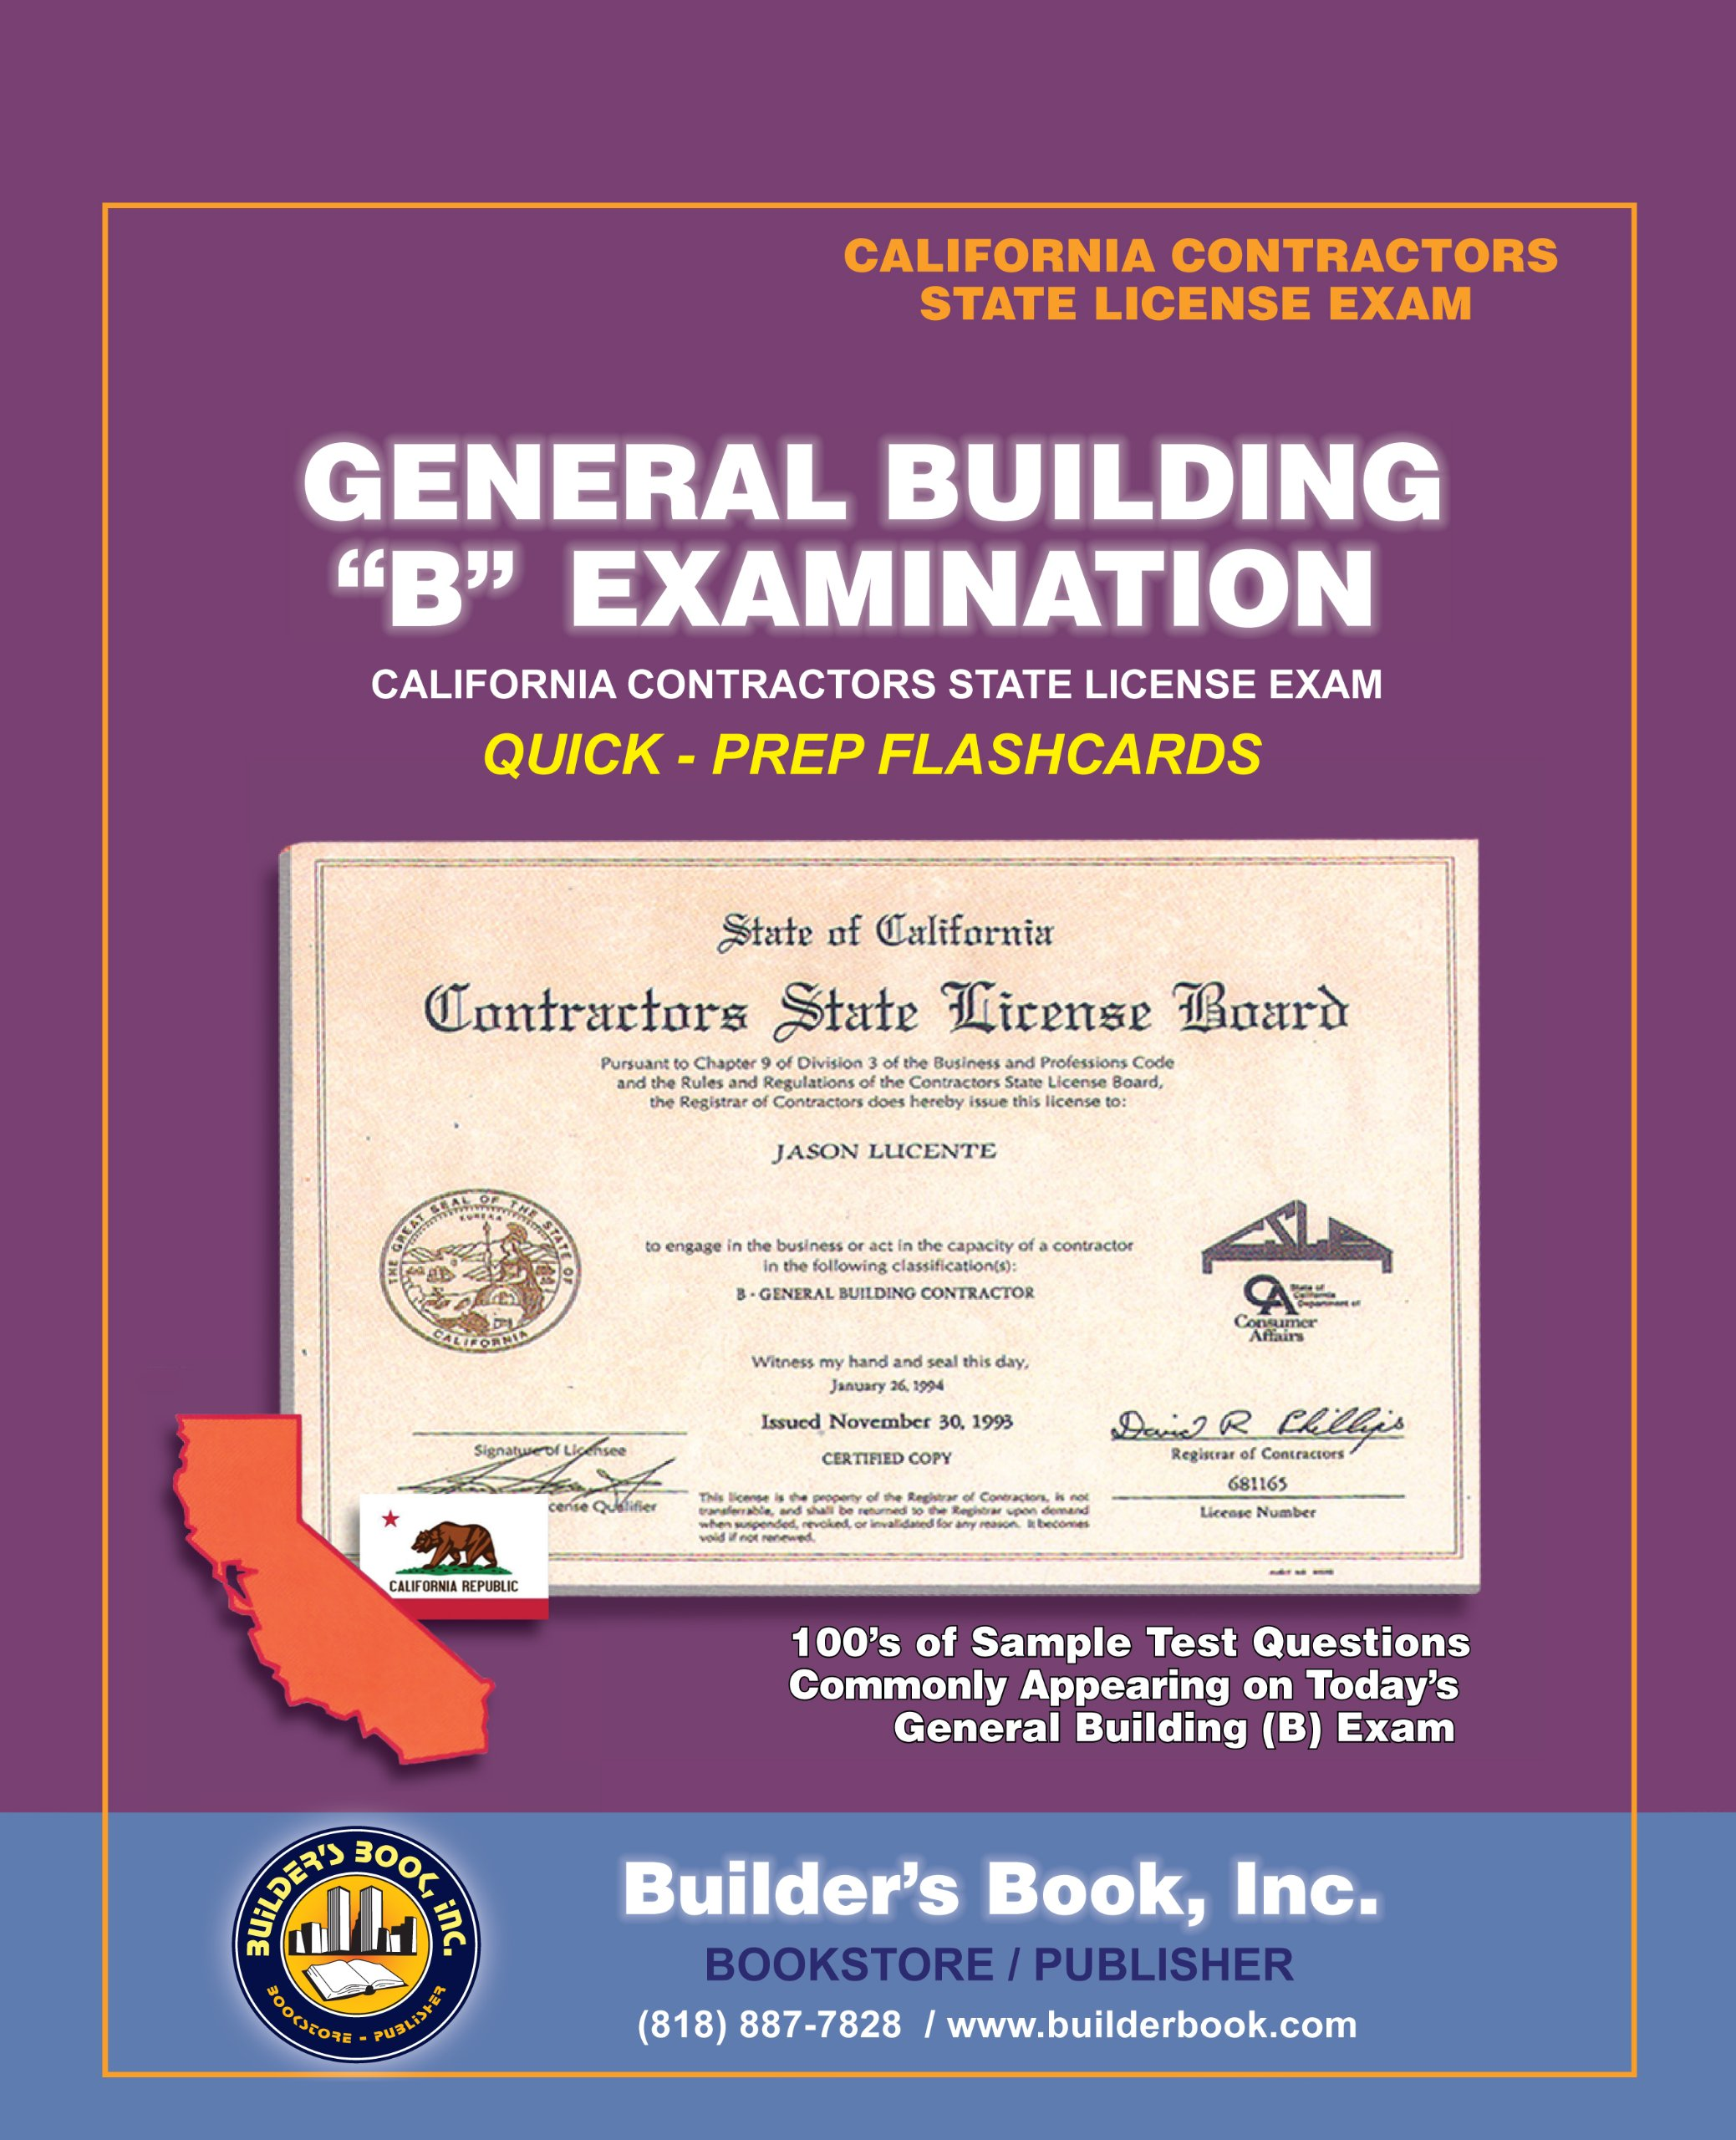 General Contractor Exam Sample Questions